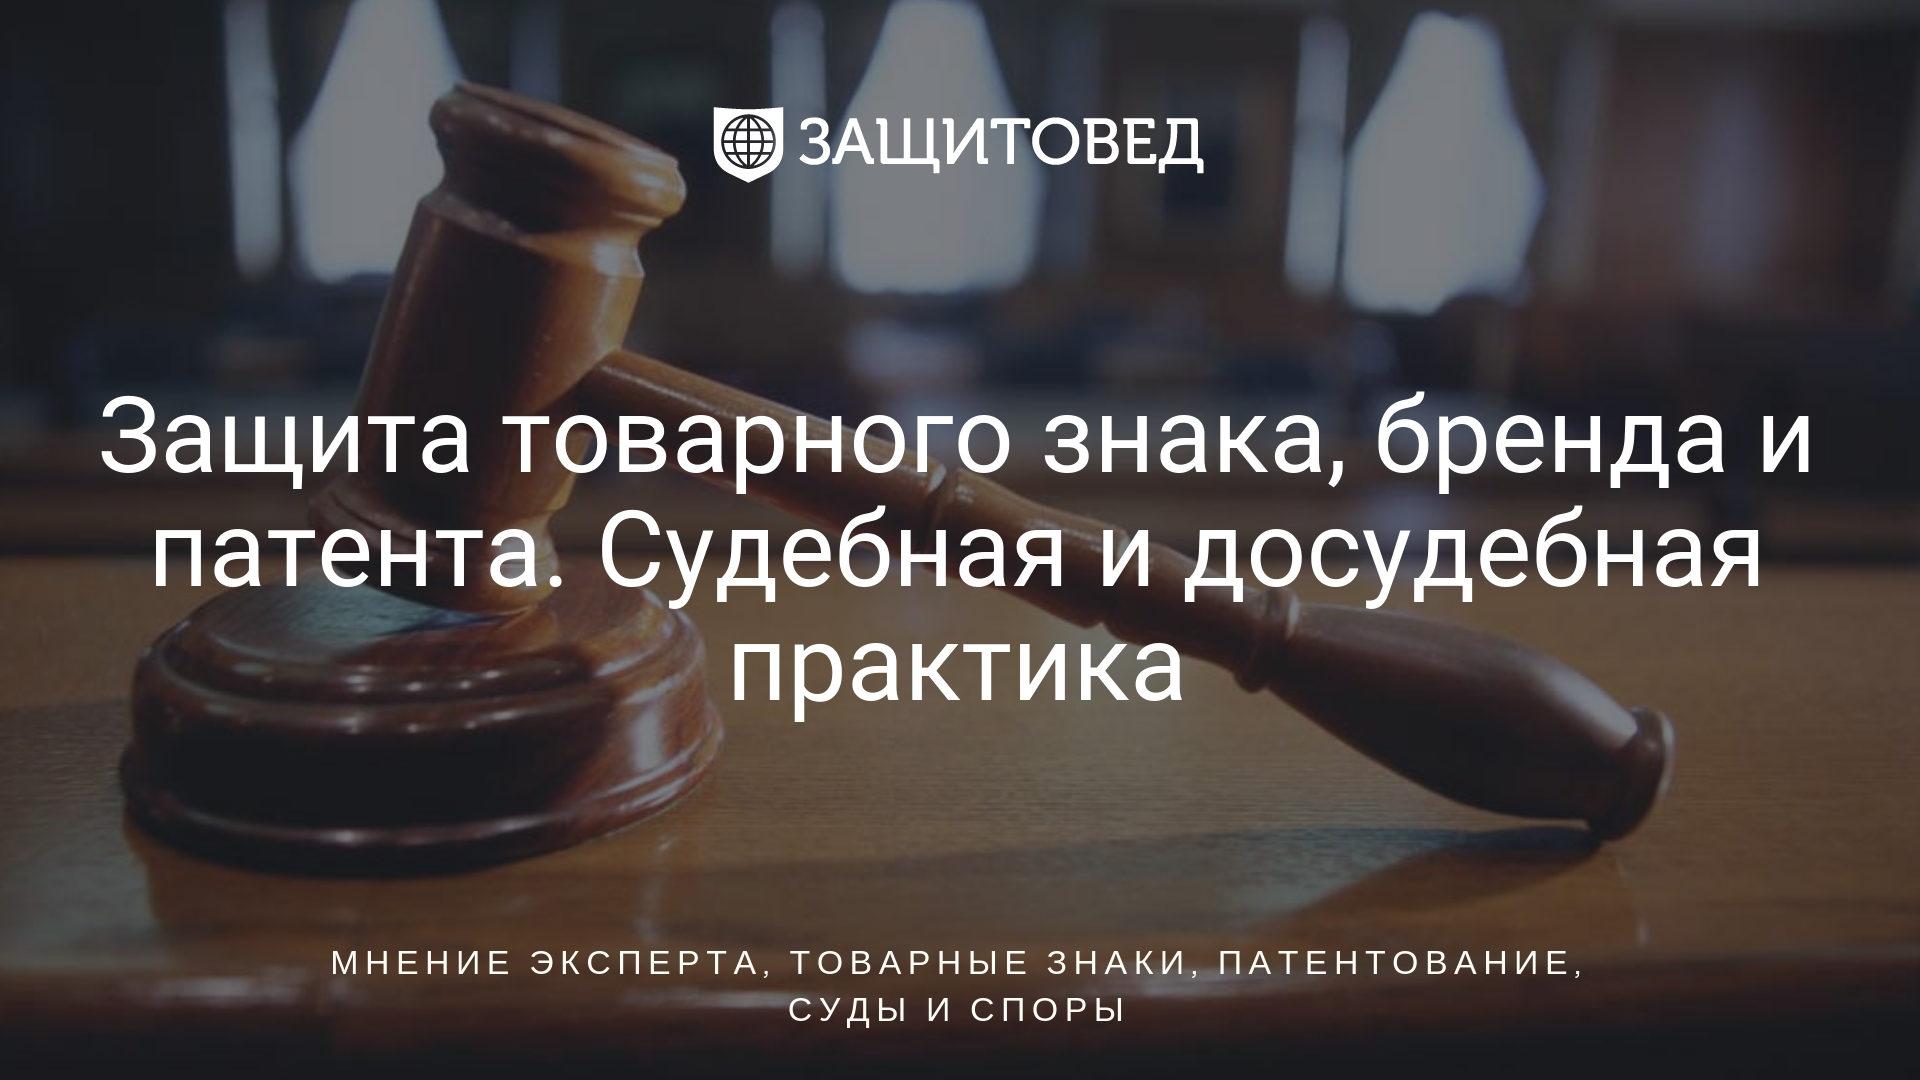 судебная практика по патентным спорам